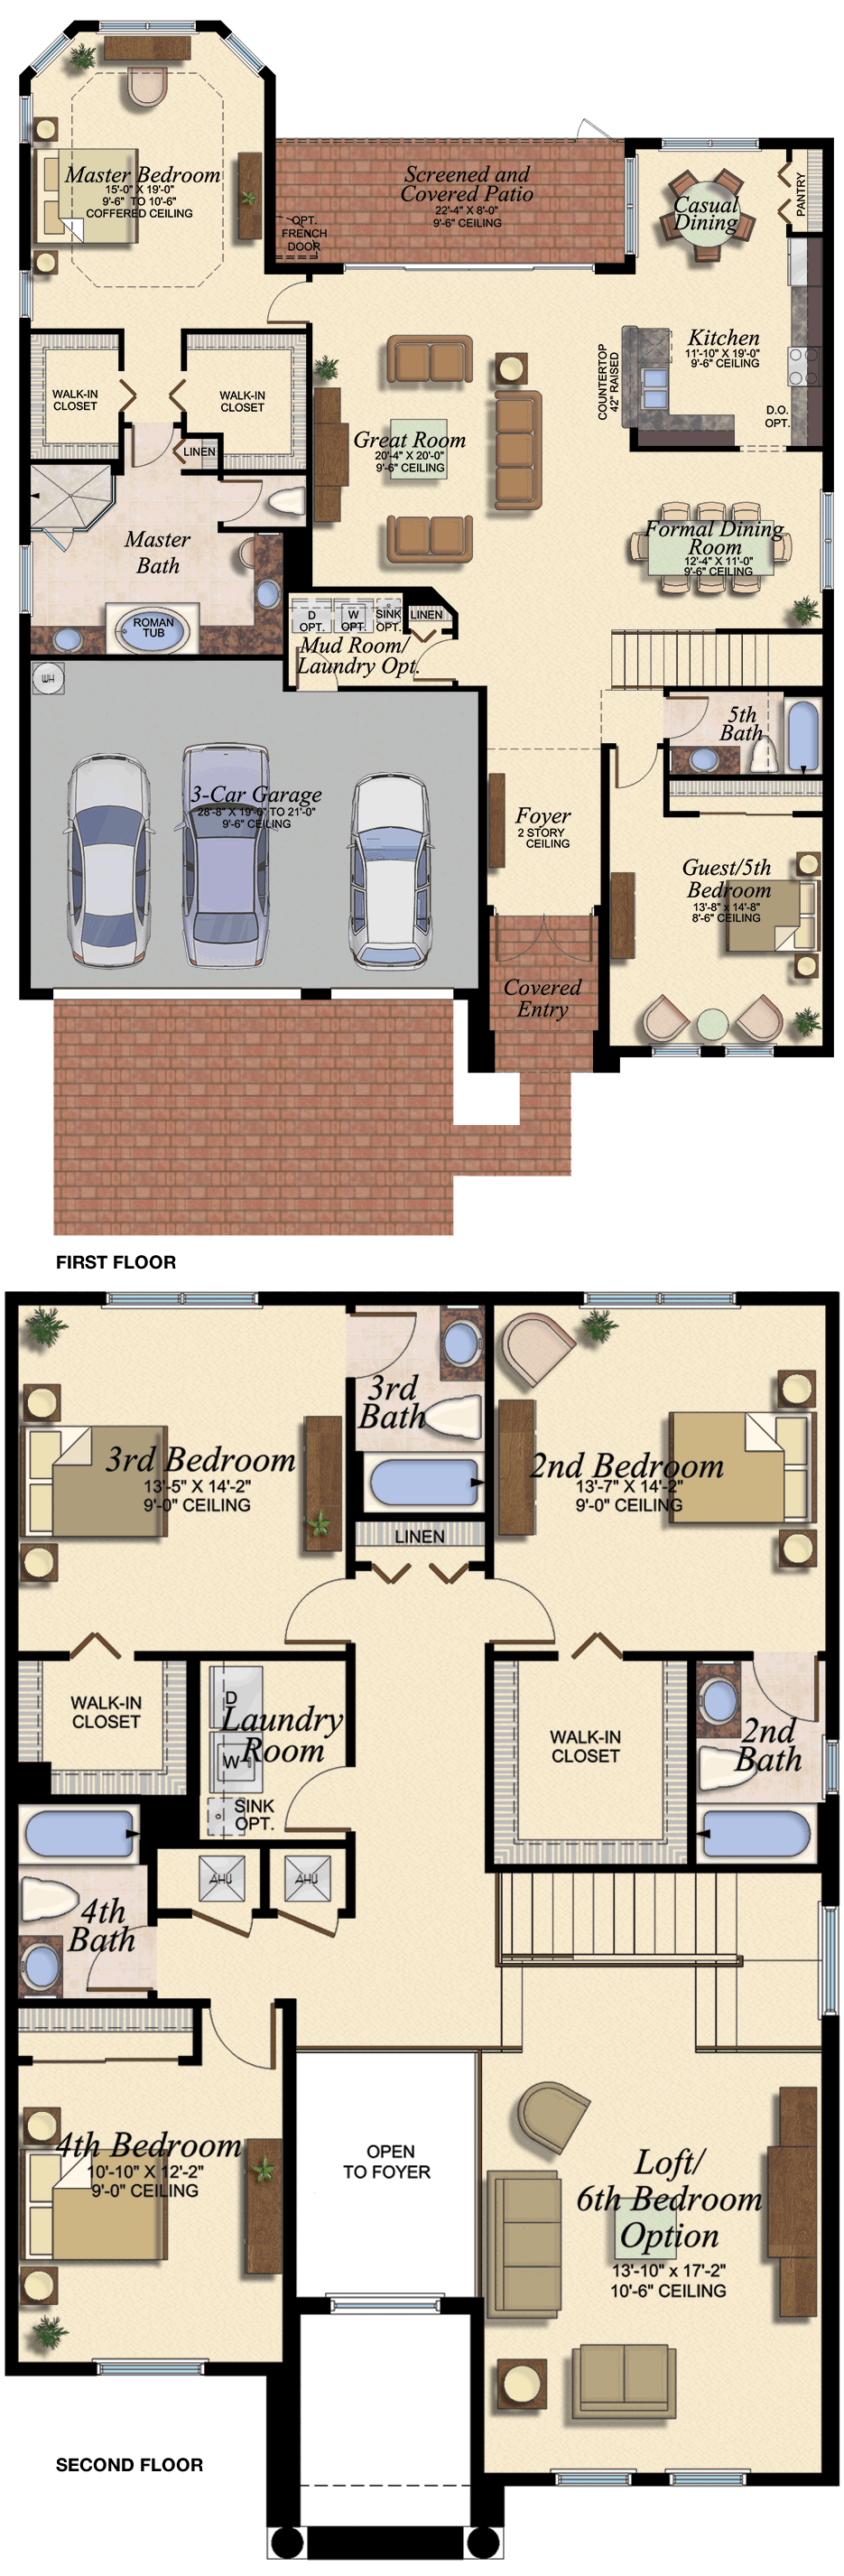 Mandalay floor plan large view interior design pinterest